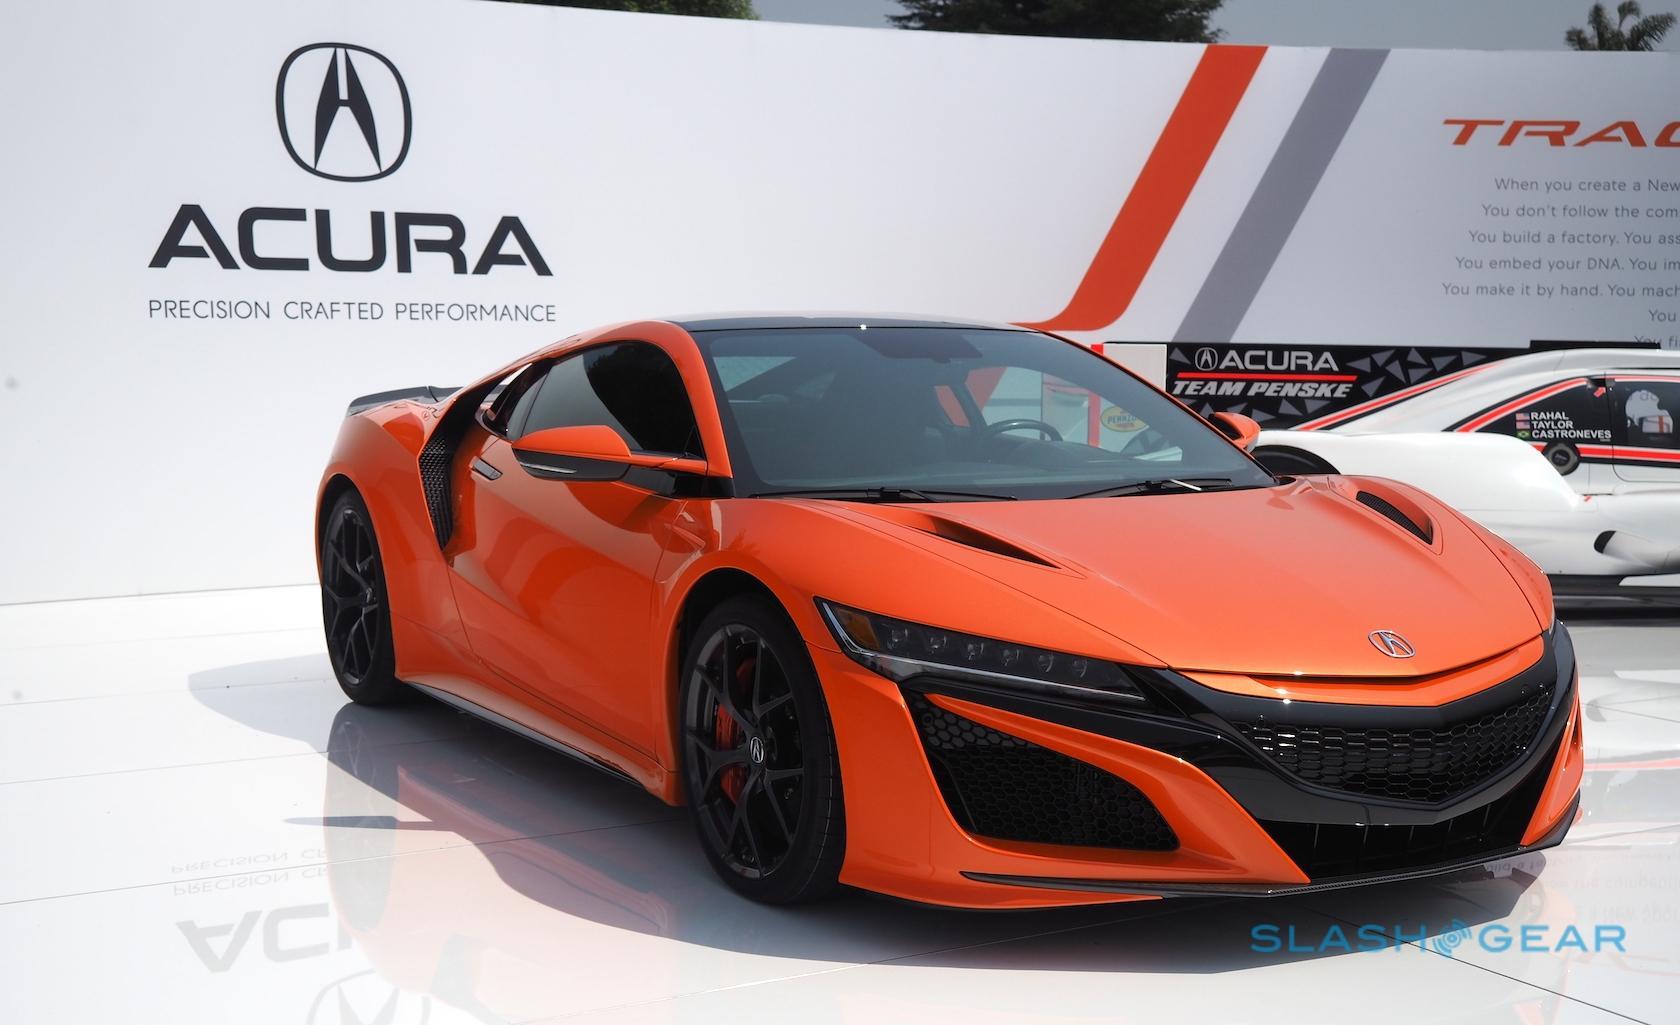 The Top 6 Supercars for Under $200k - SlashGear